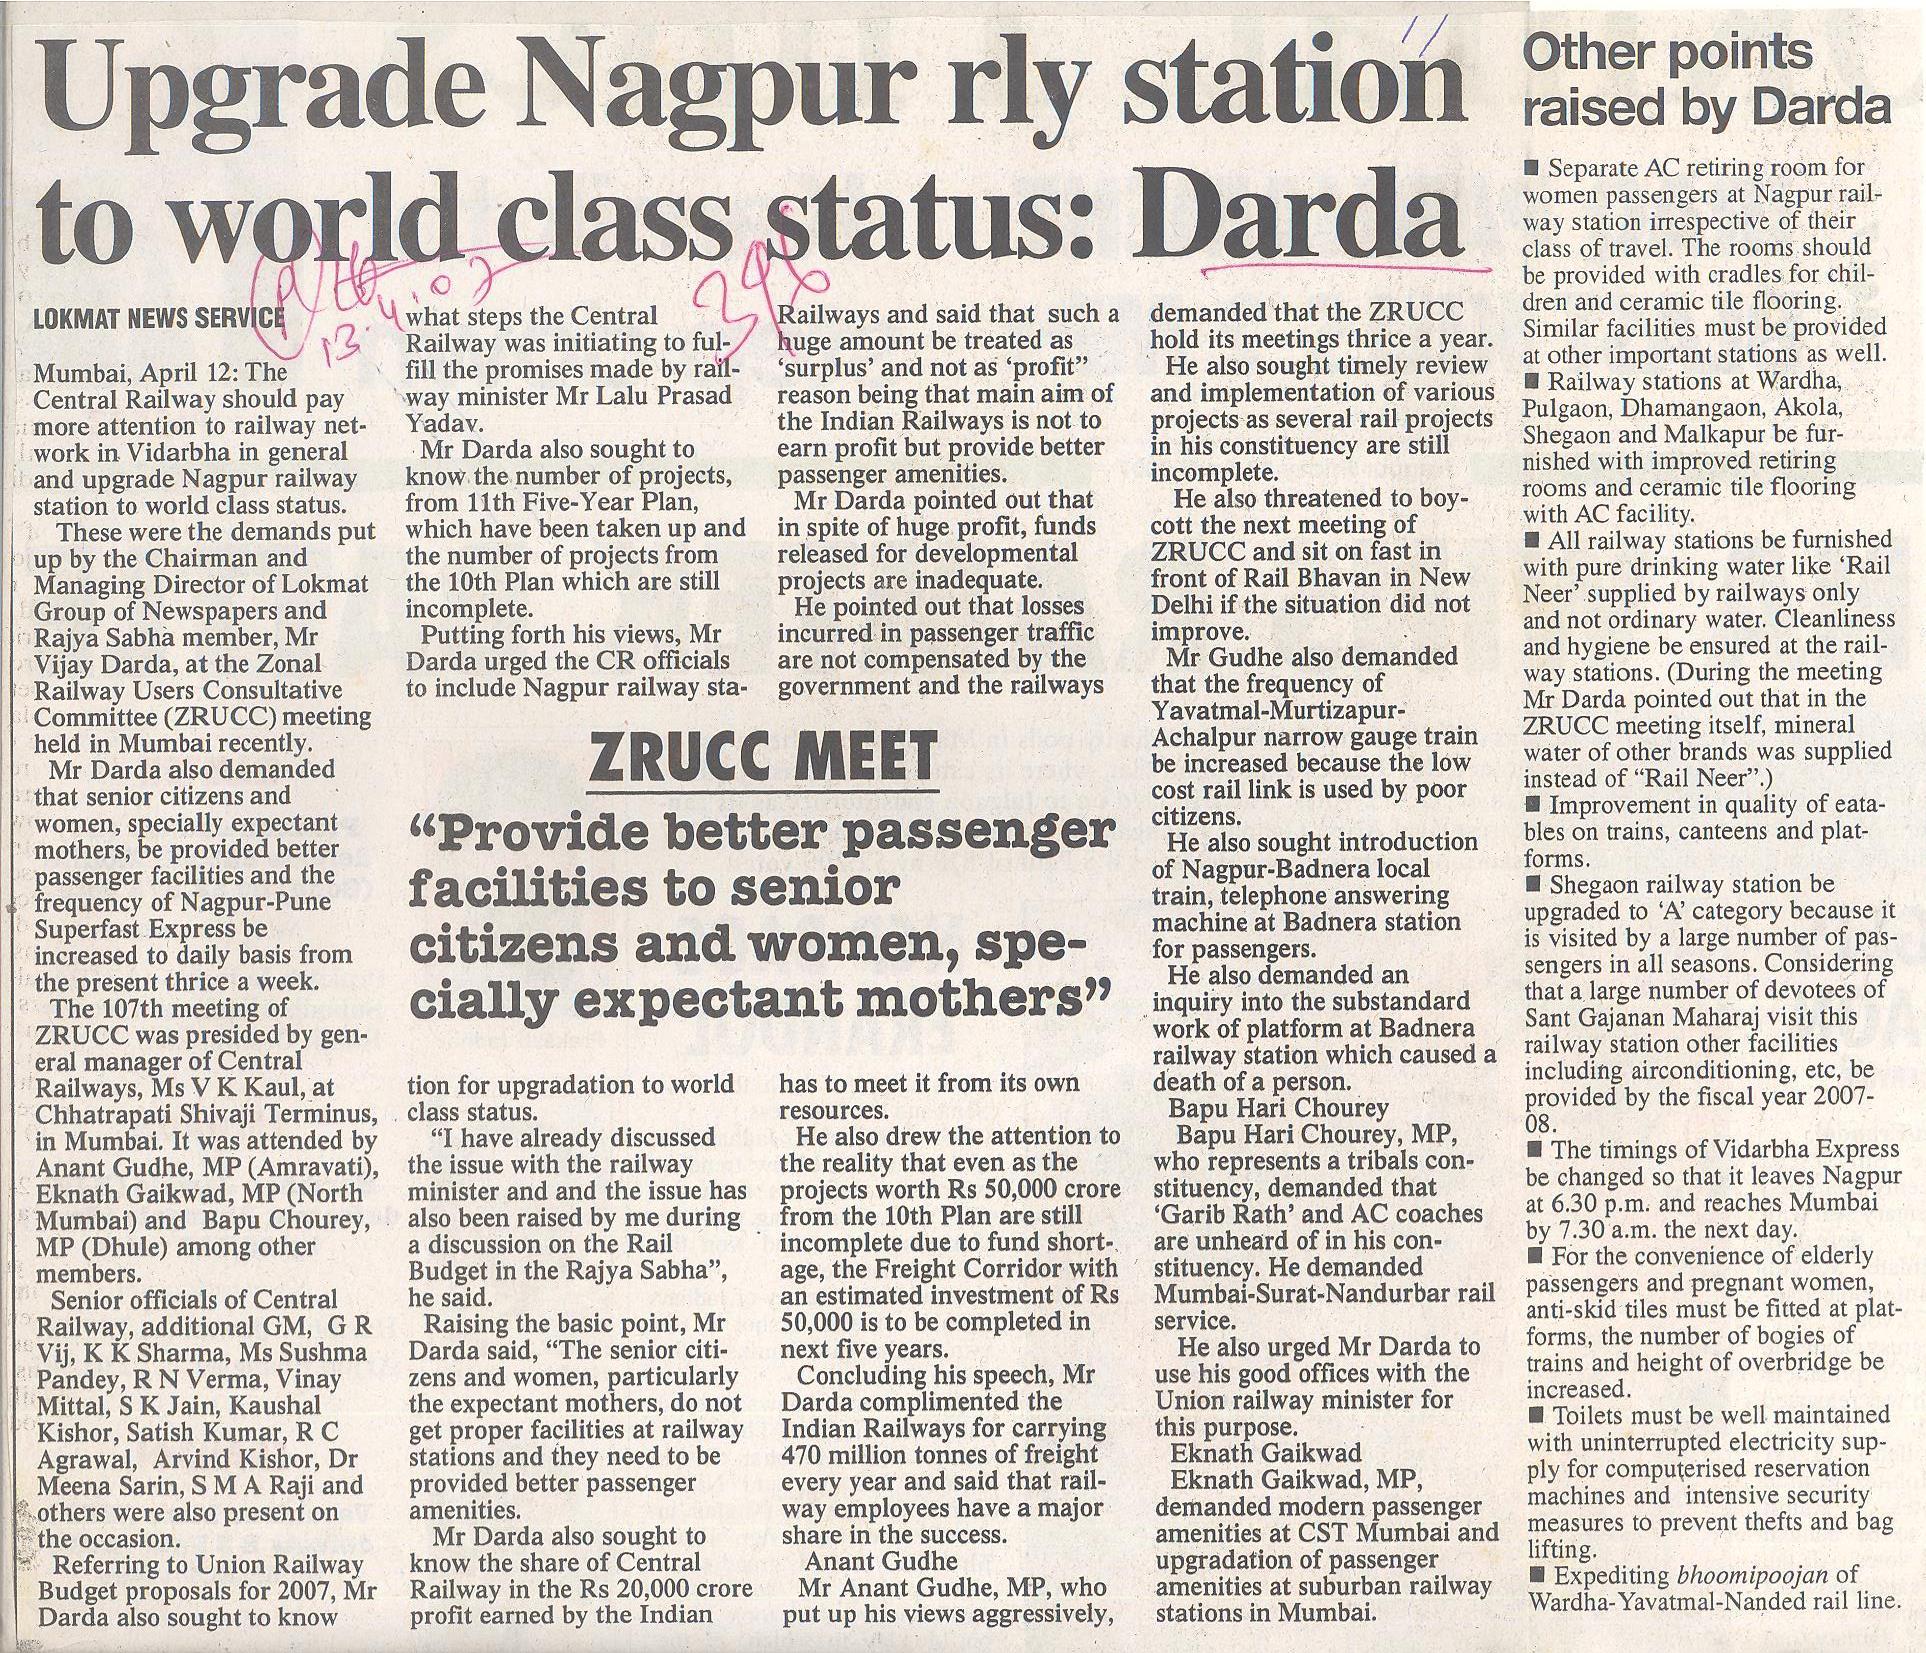 Upgrade Nagpur rly station to world class status: Darda